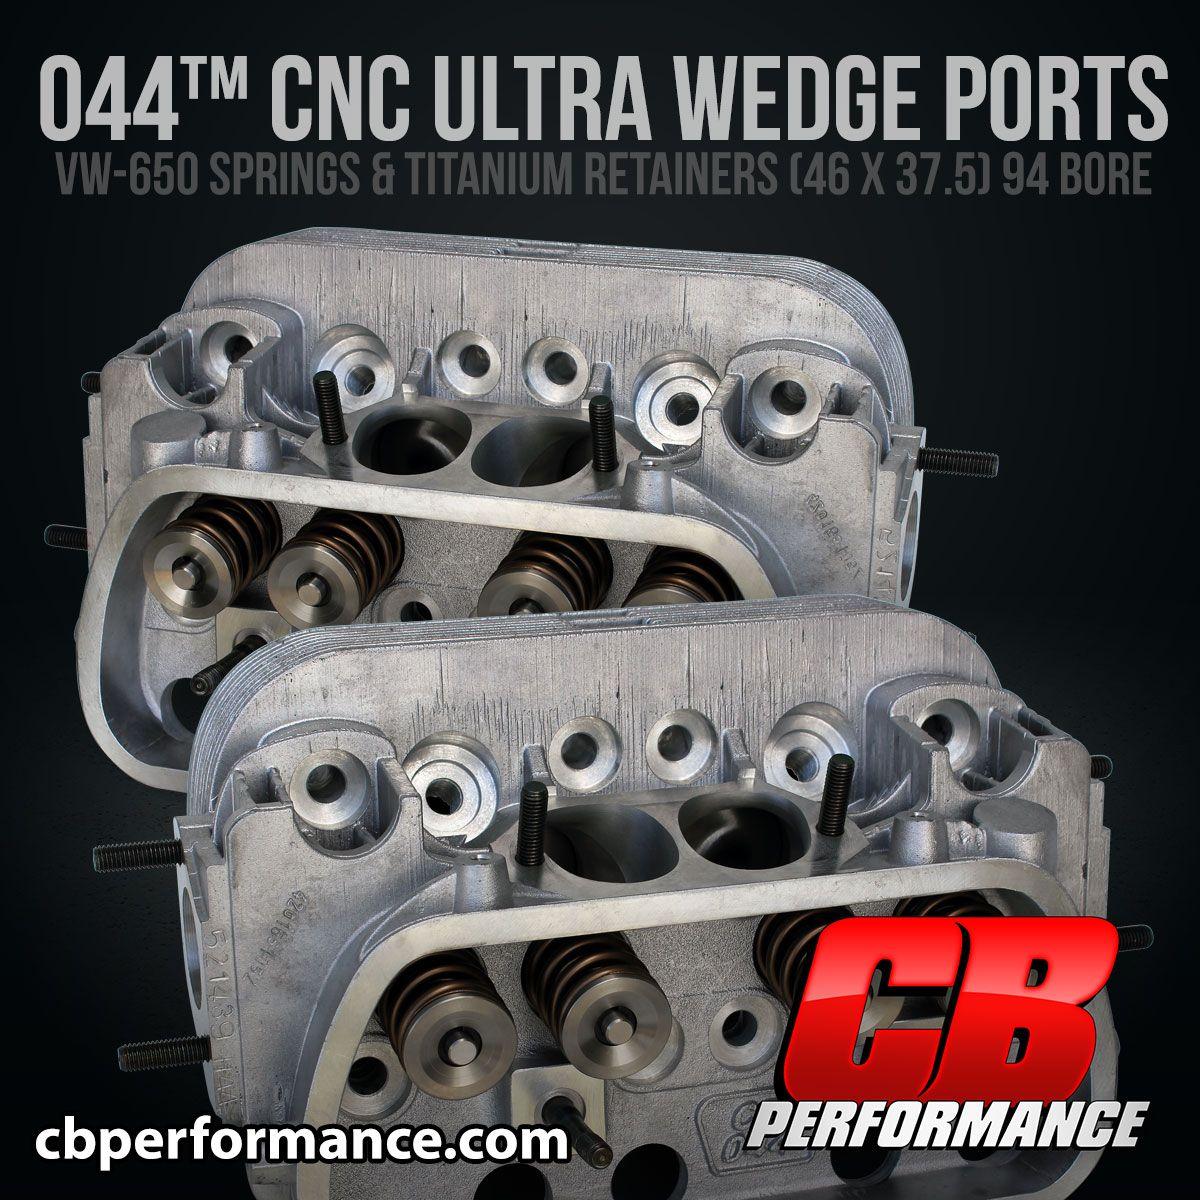 1409 044™ CNC Ultra Wedge Ports - VW650 Valve Springs & Titanium